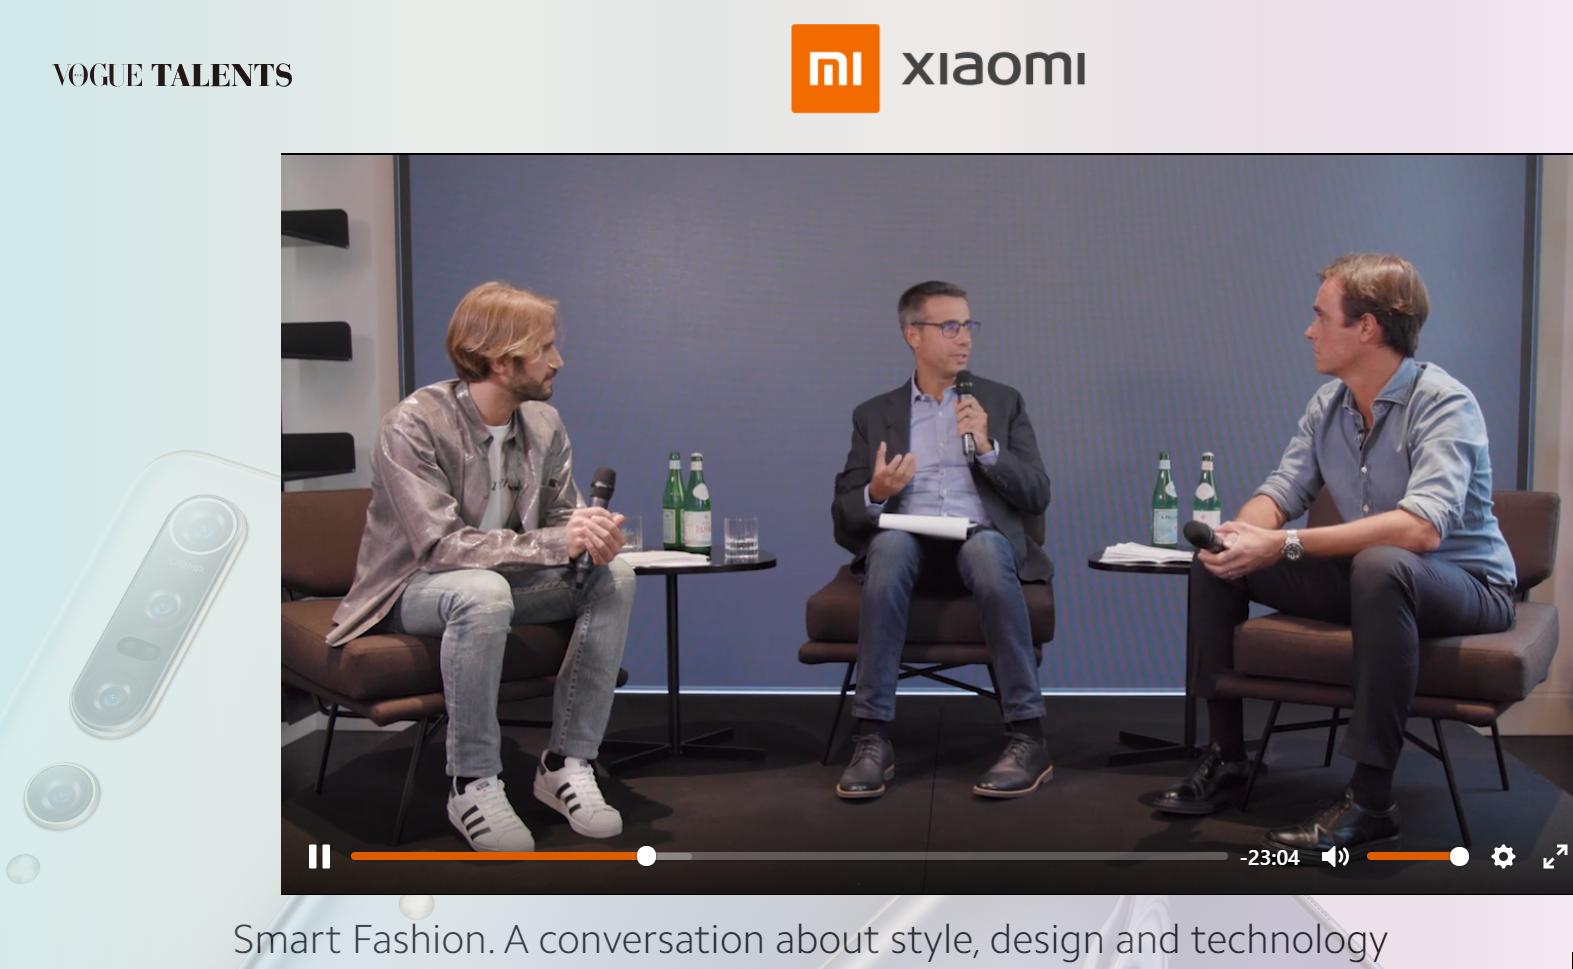 Xiaomi - Benedetta Malavasi - Italy - The World of Vogue Talents - Sponsor 3